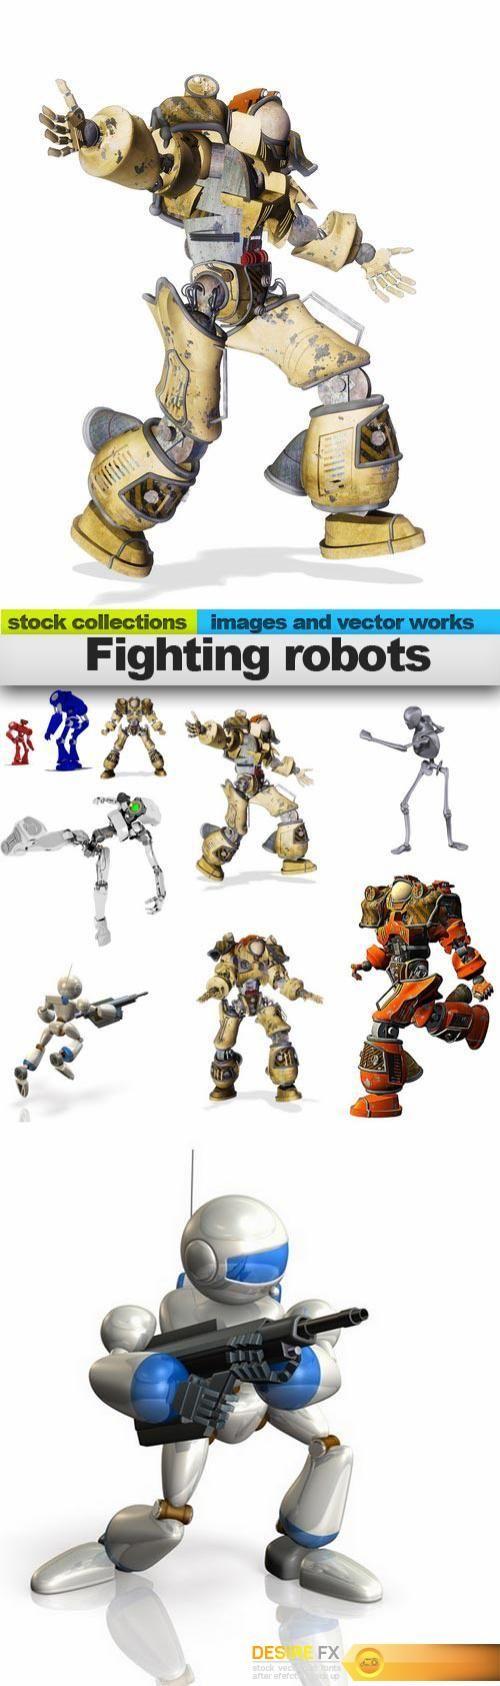 Fighting robots, 09 x UHQ JPEG  http://www.desirefx.me/fighting-robots-09-x-uhq-jpeg/